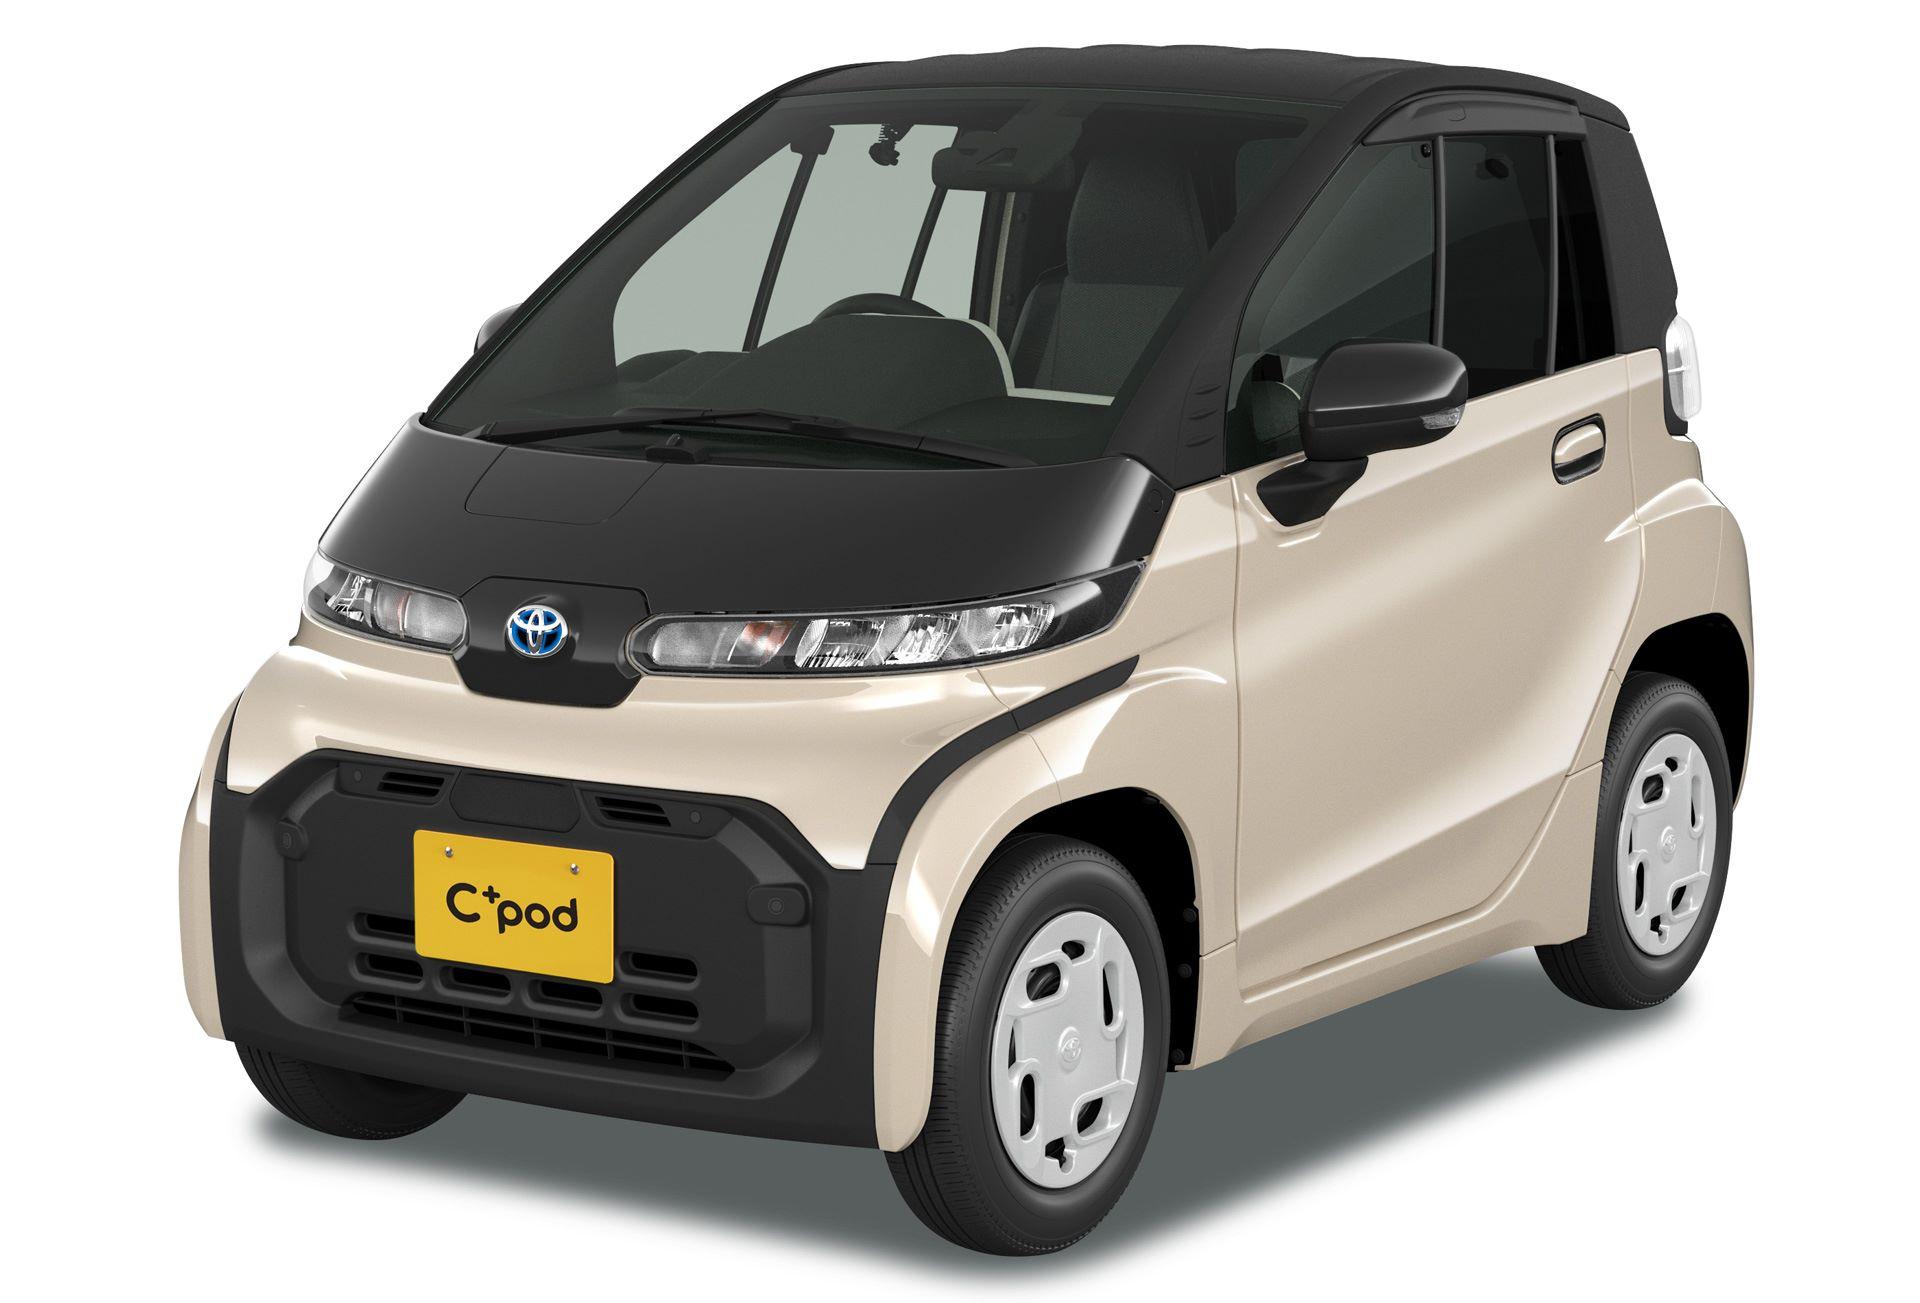 Toyota-C-pod-15